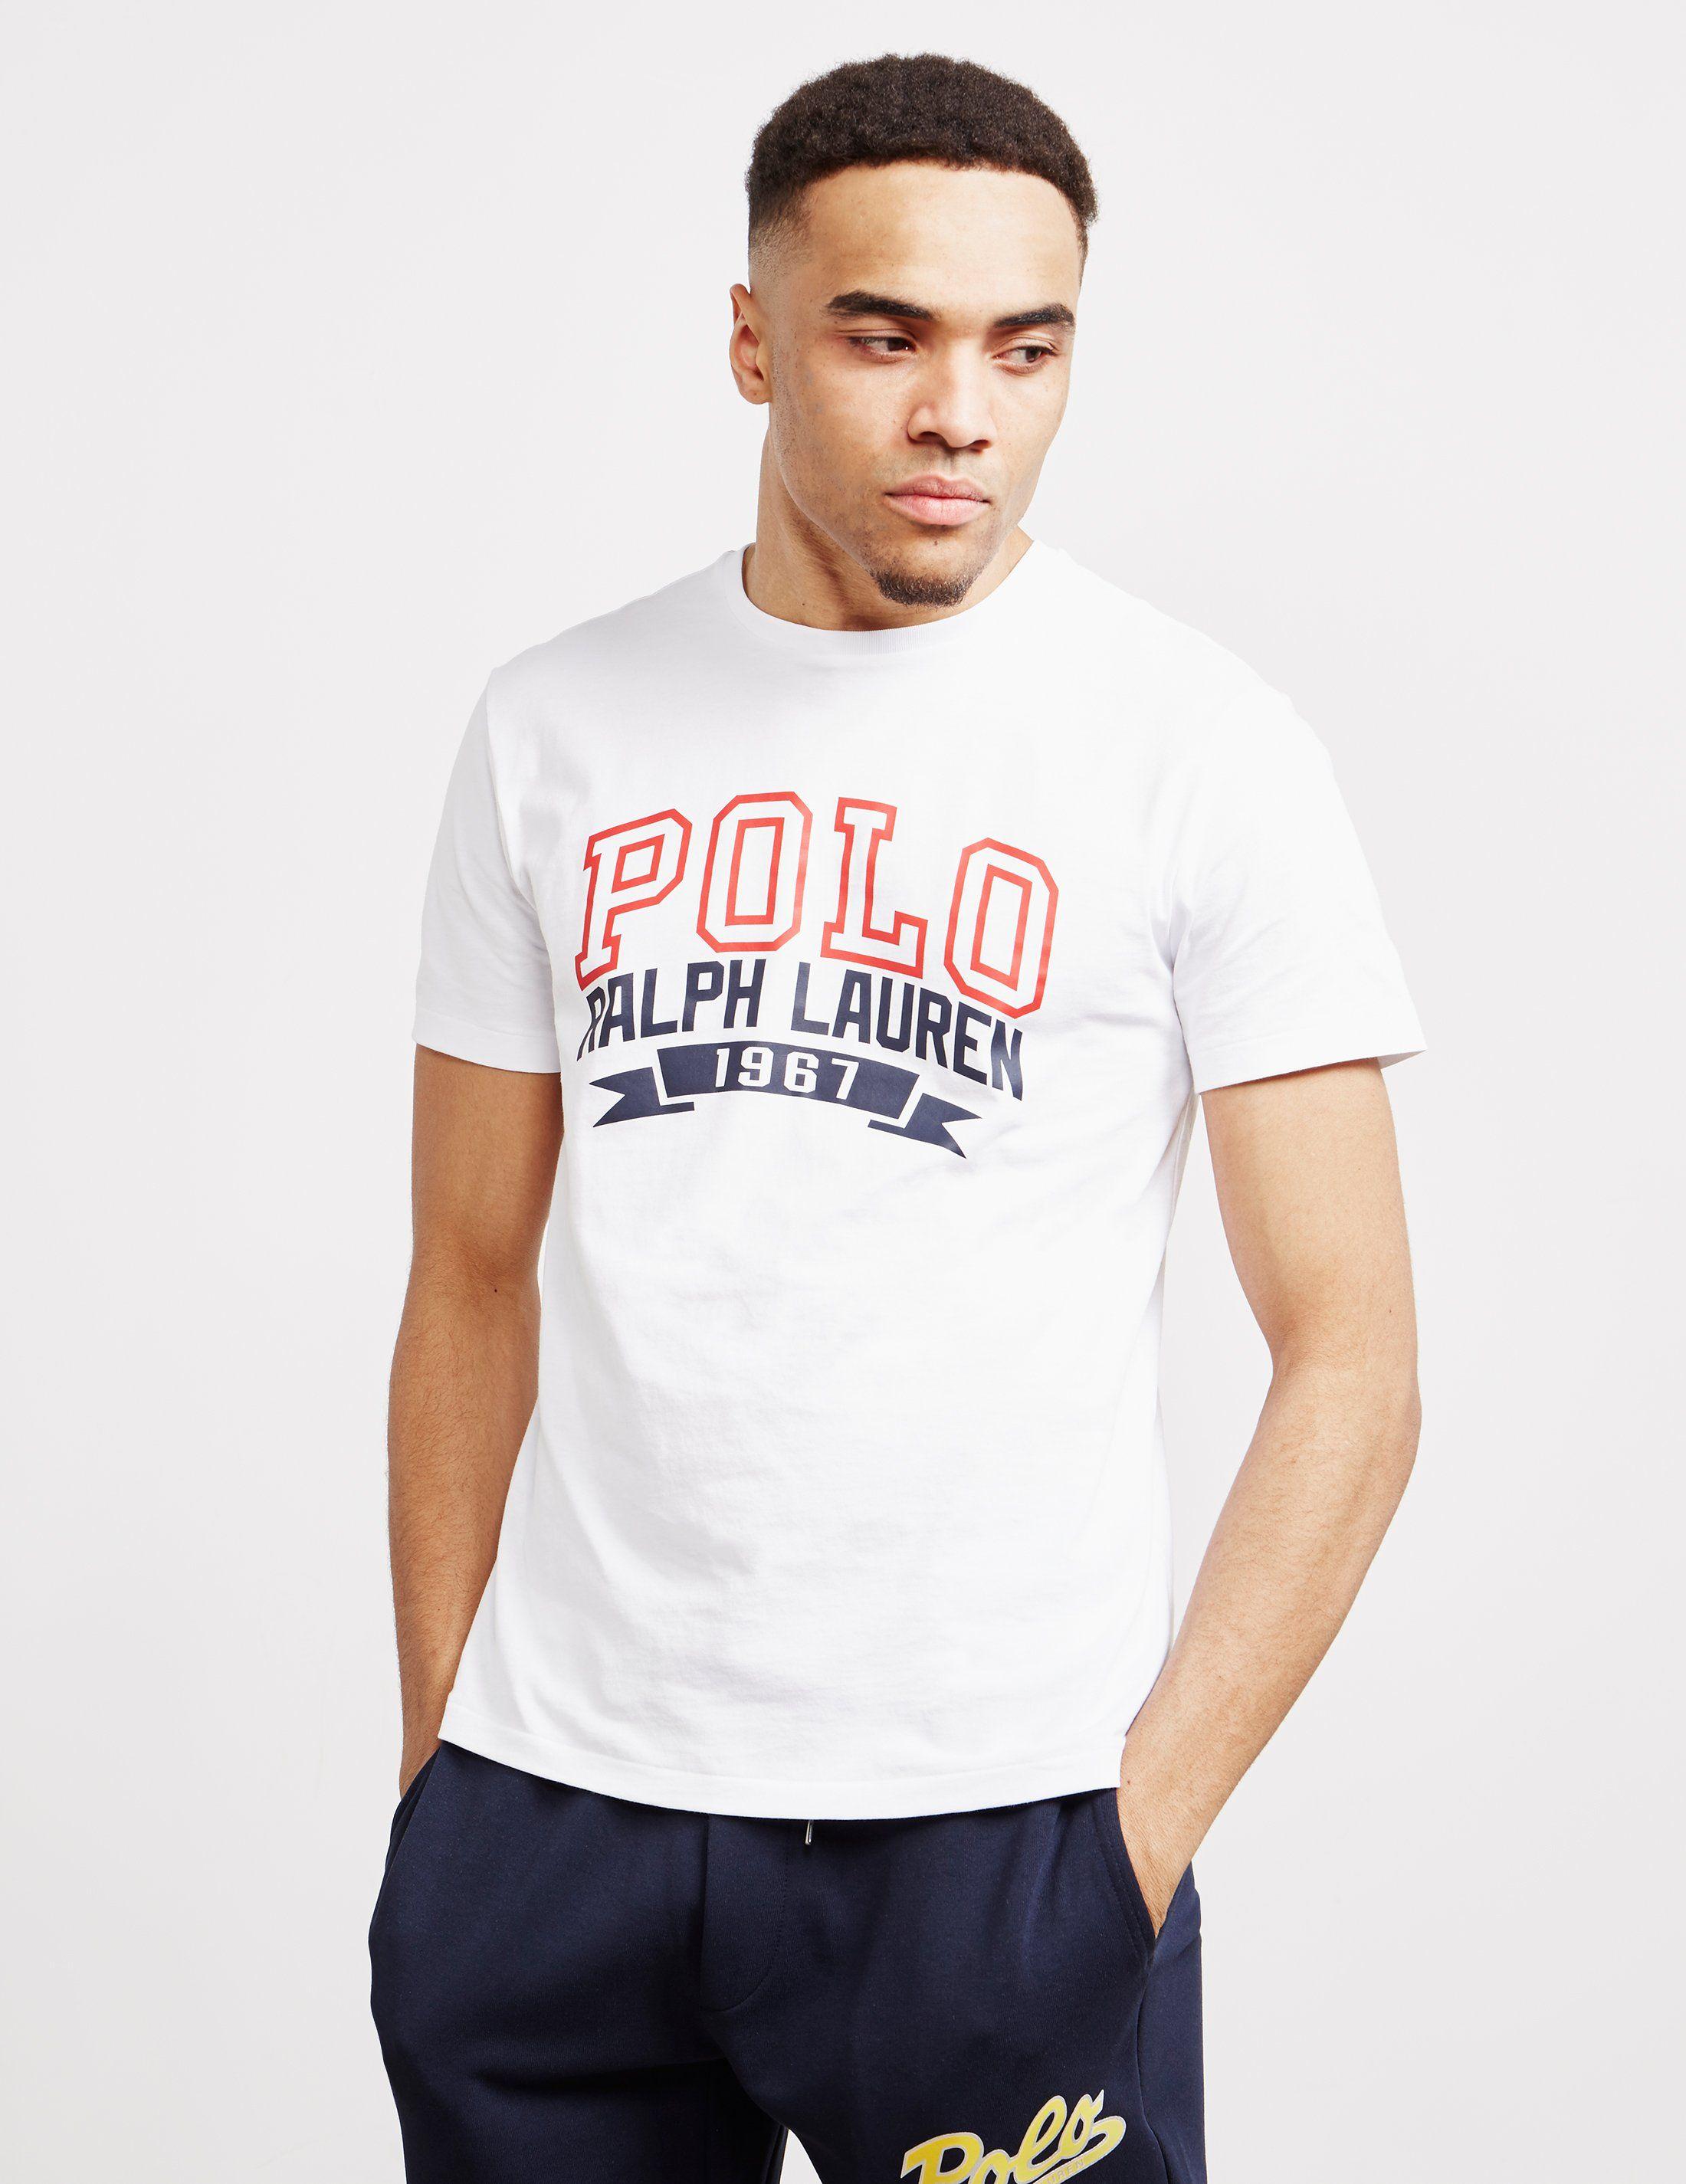 Polo Ralph Lauren Polo Logo Short Sleeve T-Shirt